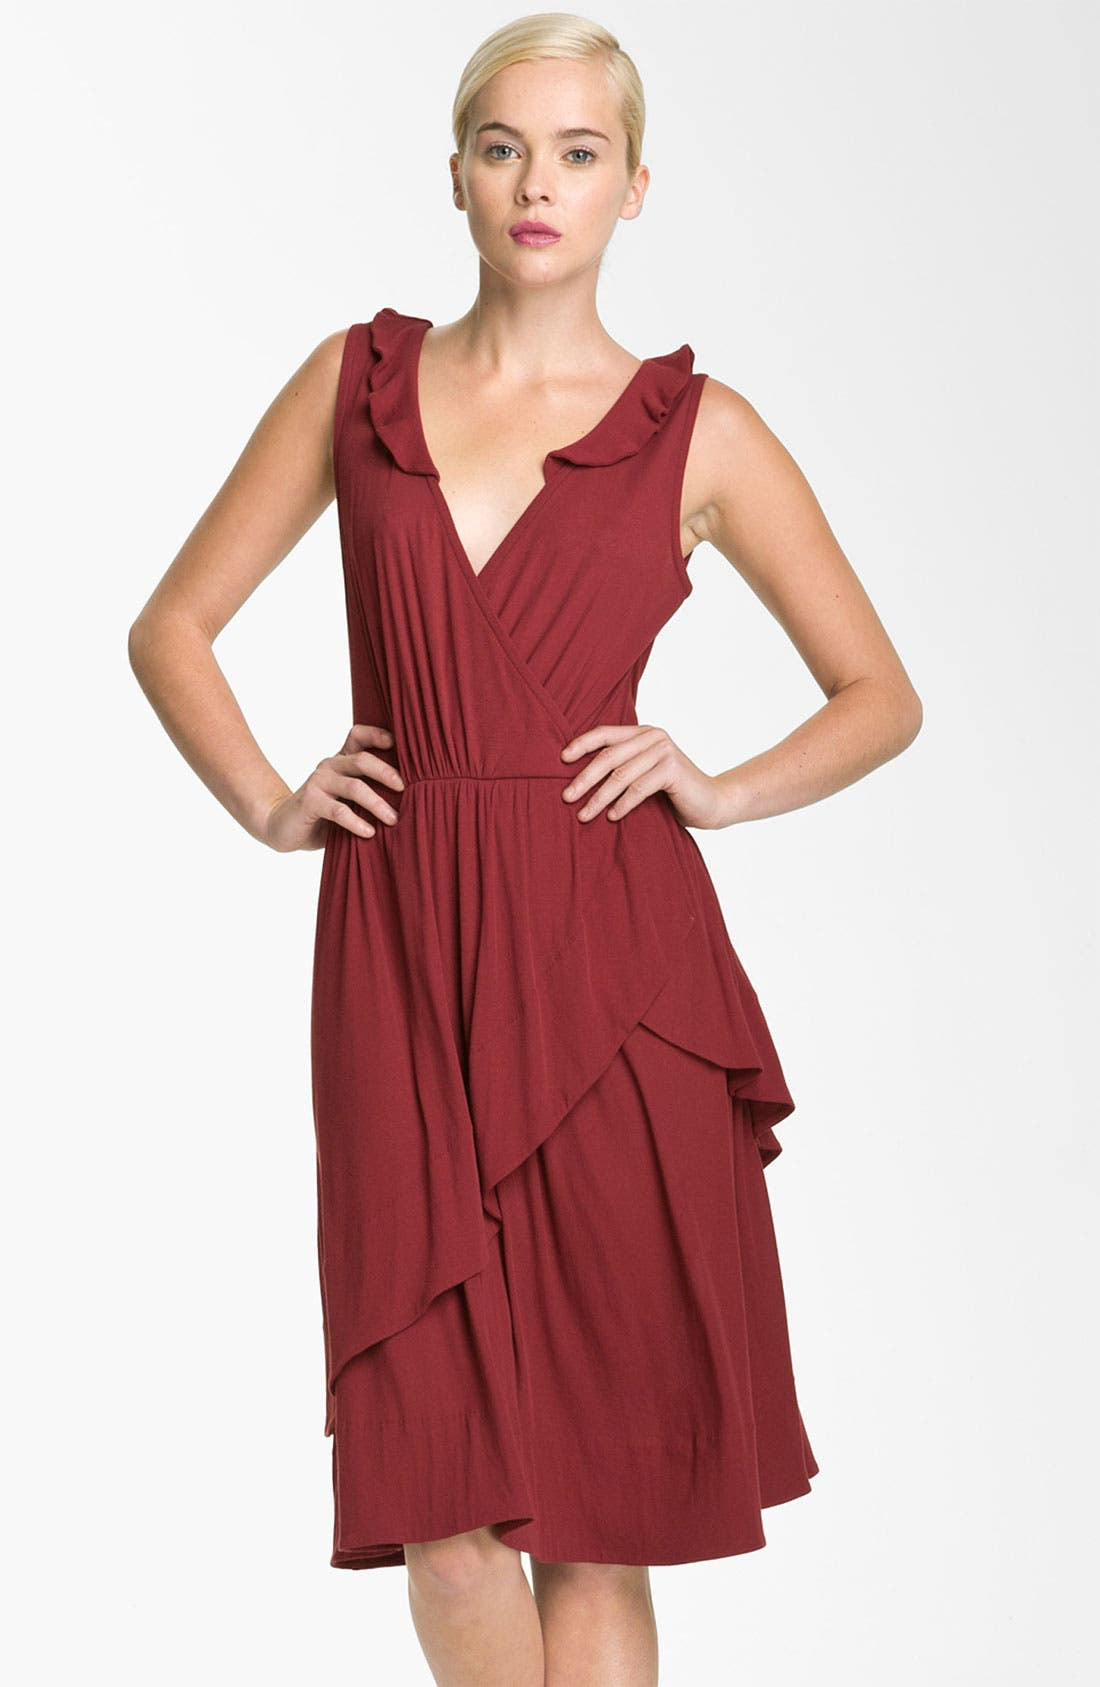 Alternate Image 1 Selected - MARC BY MARC JACOBS 'Cornelian' Dress